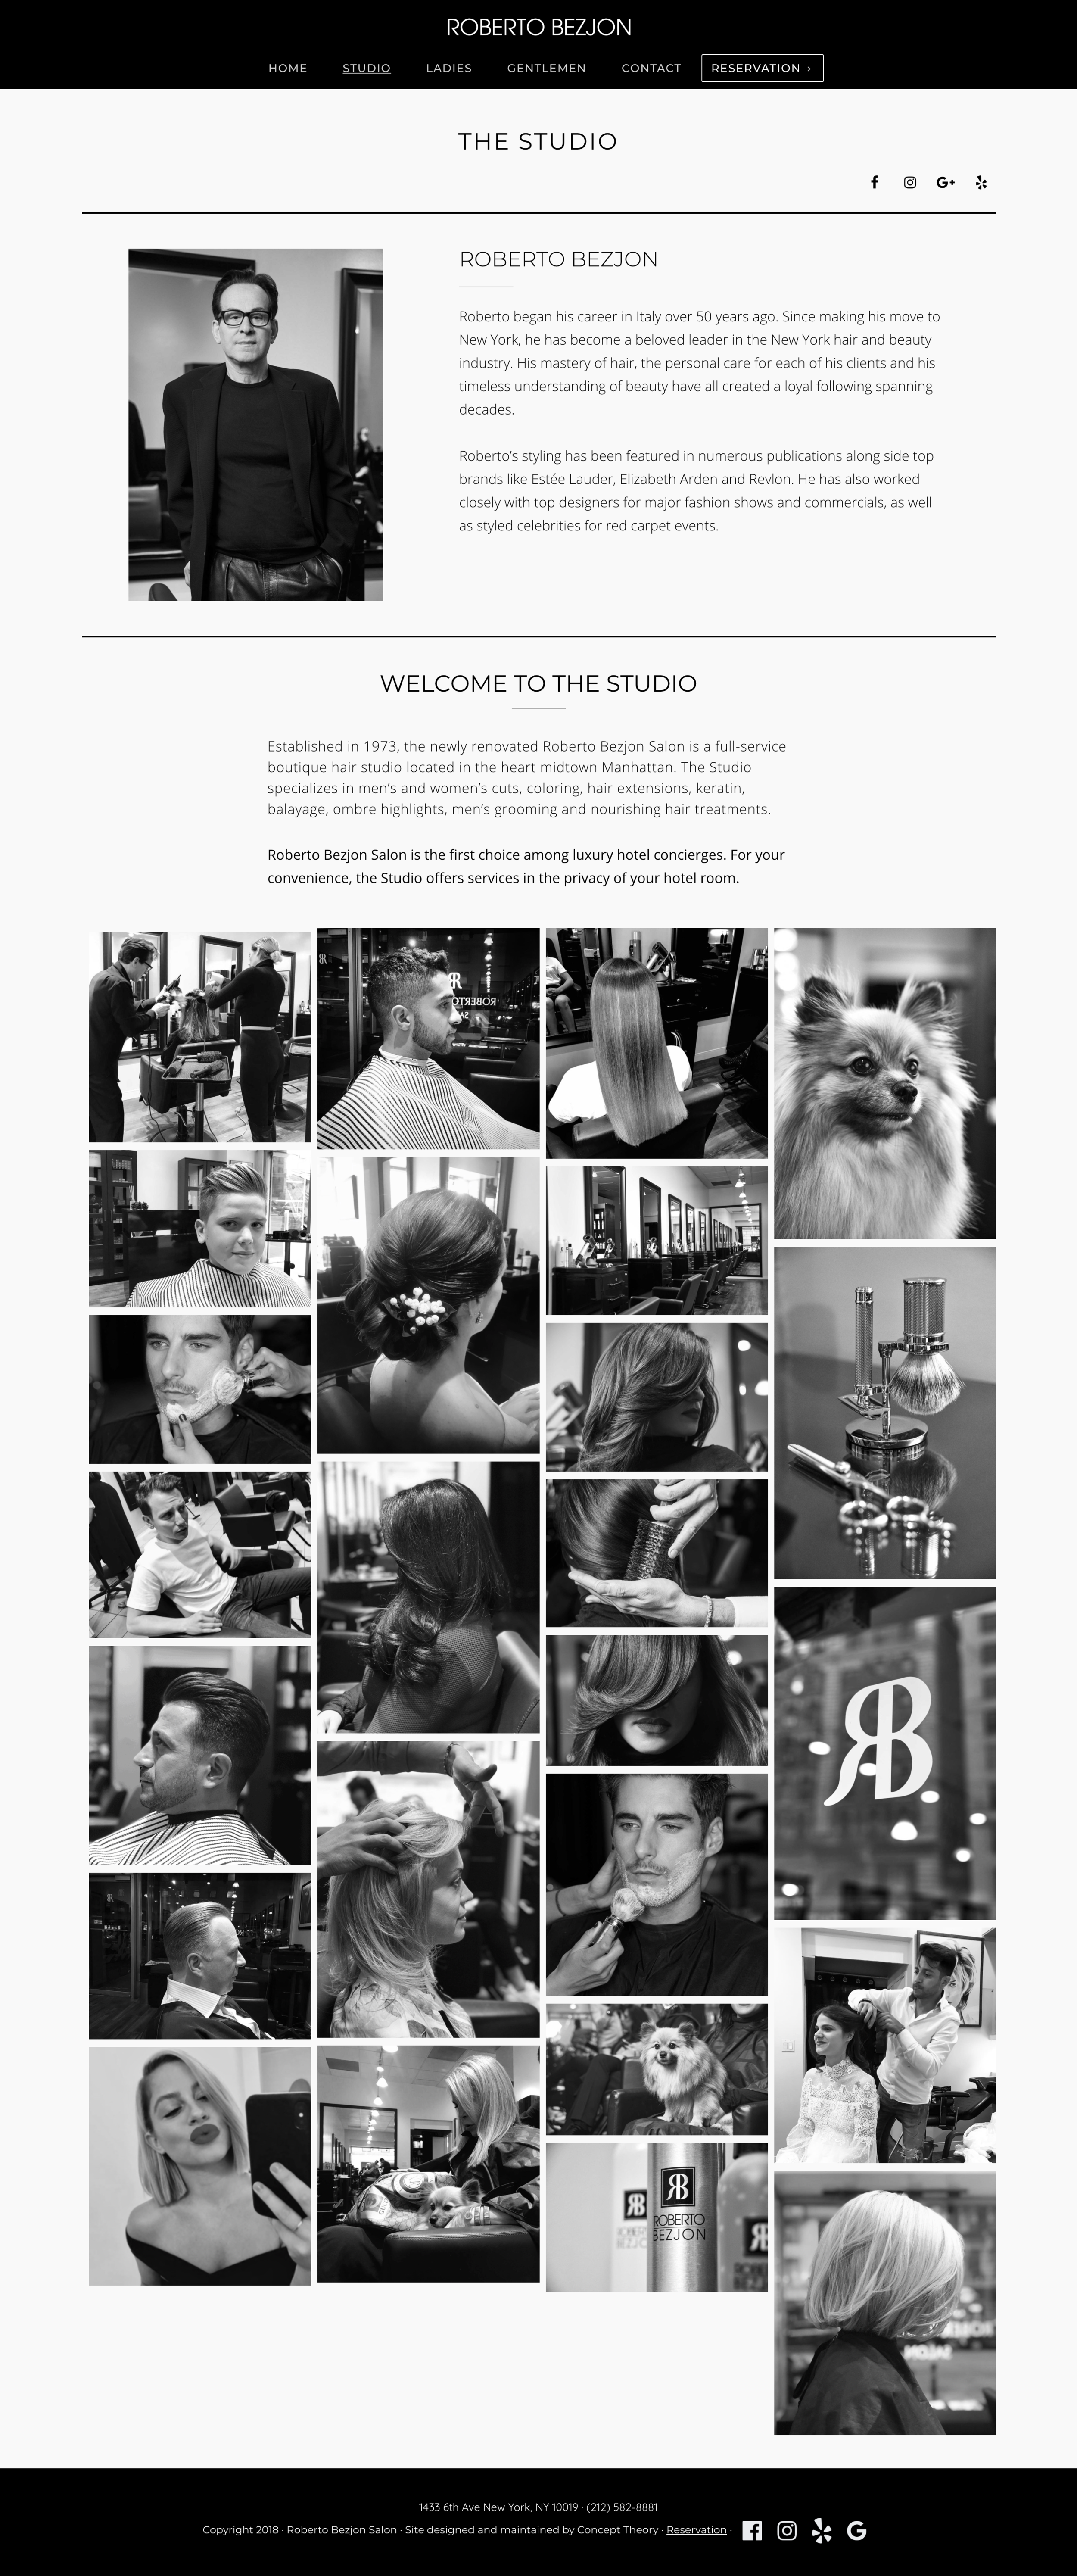 screencapture-robertobezjon-the-studio-2019-03-28-12_44_17.png